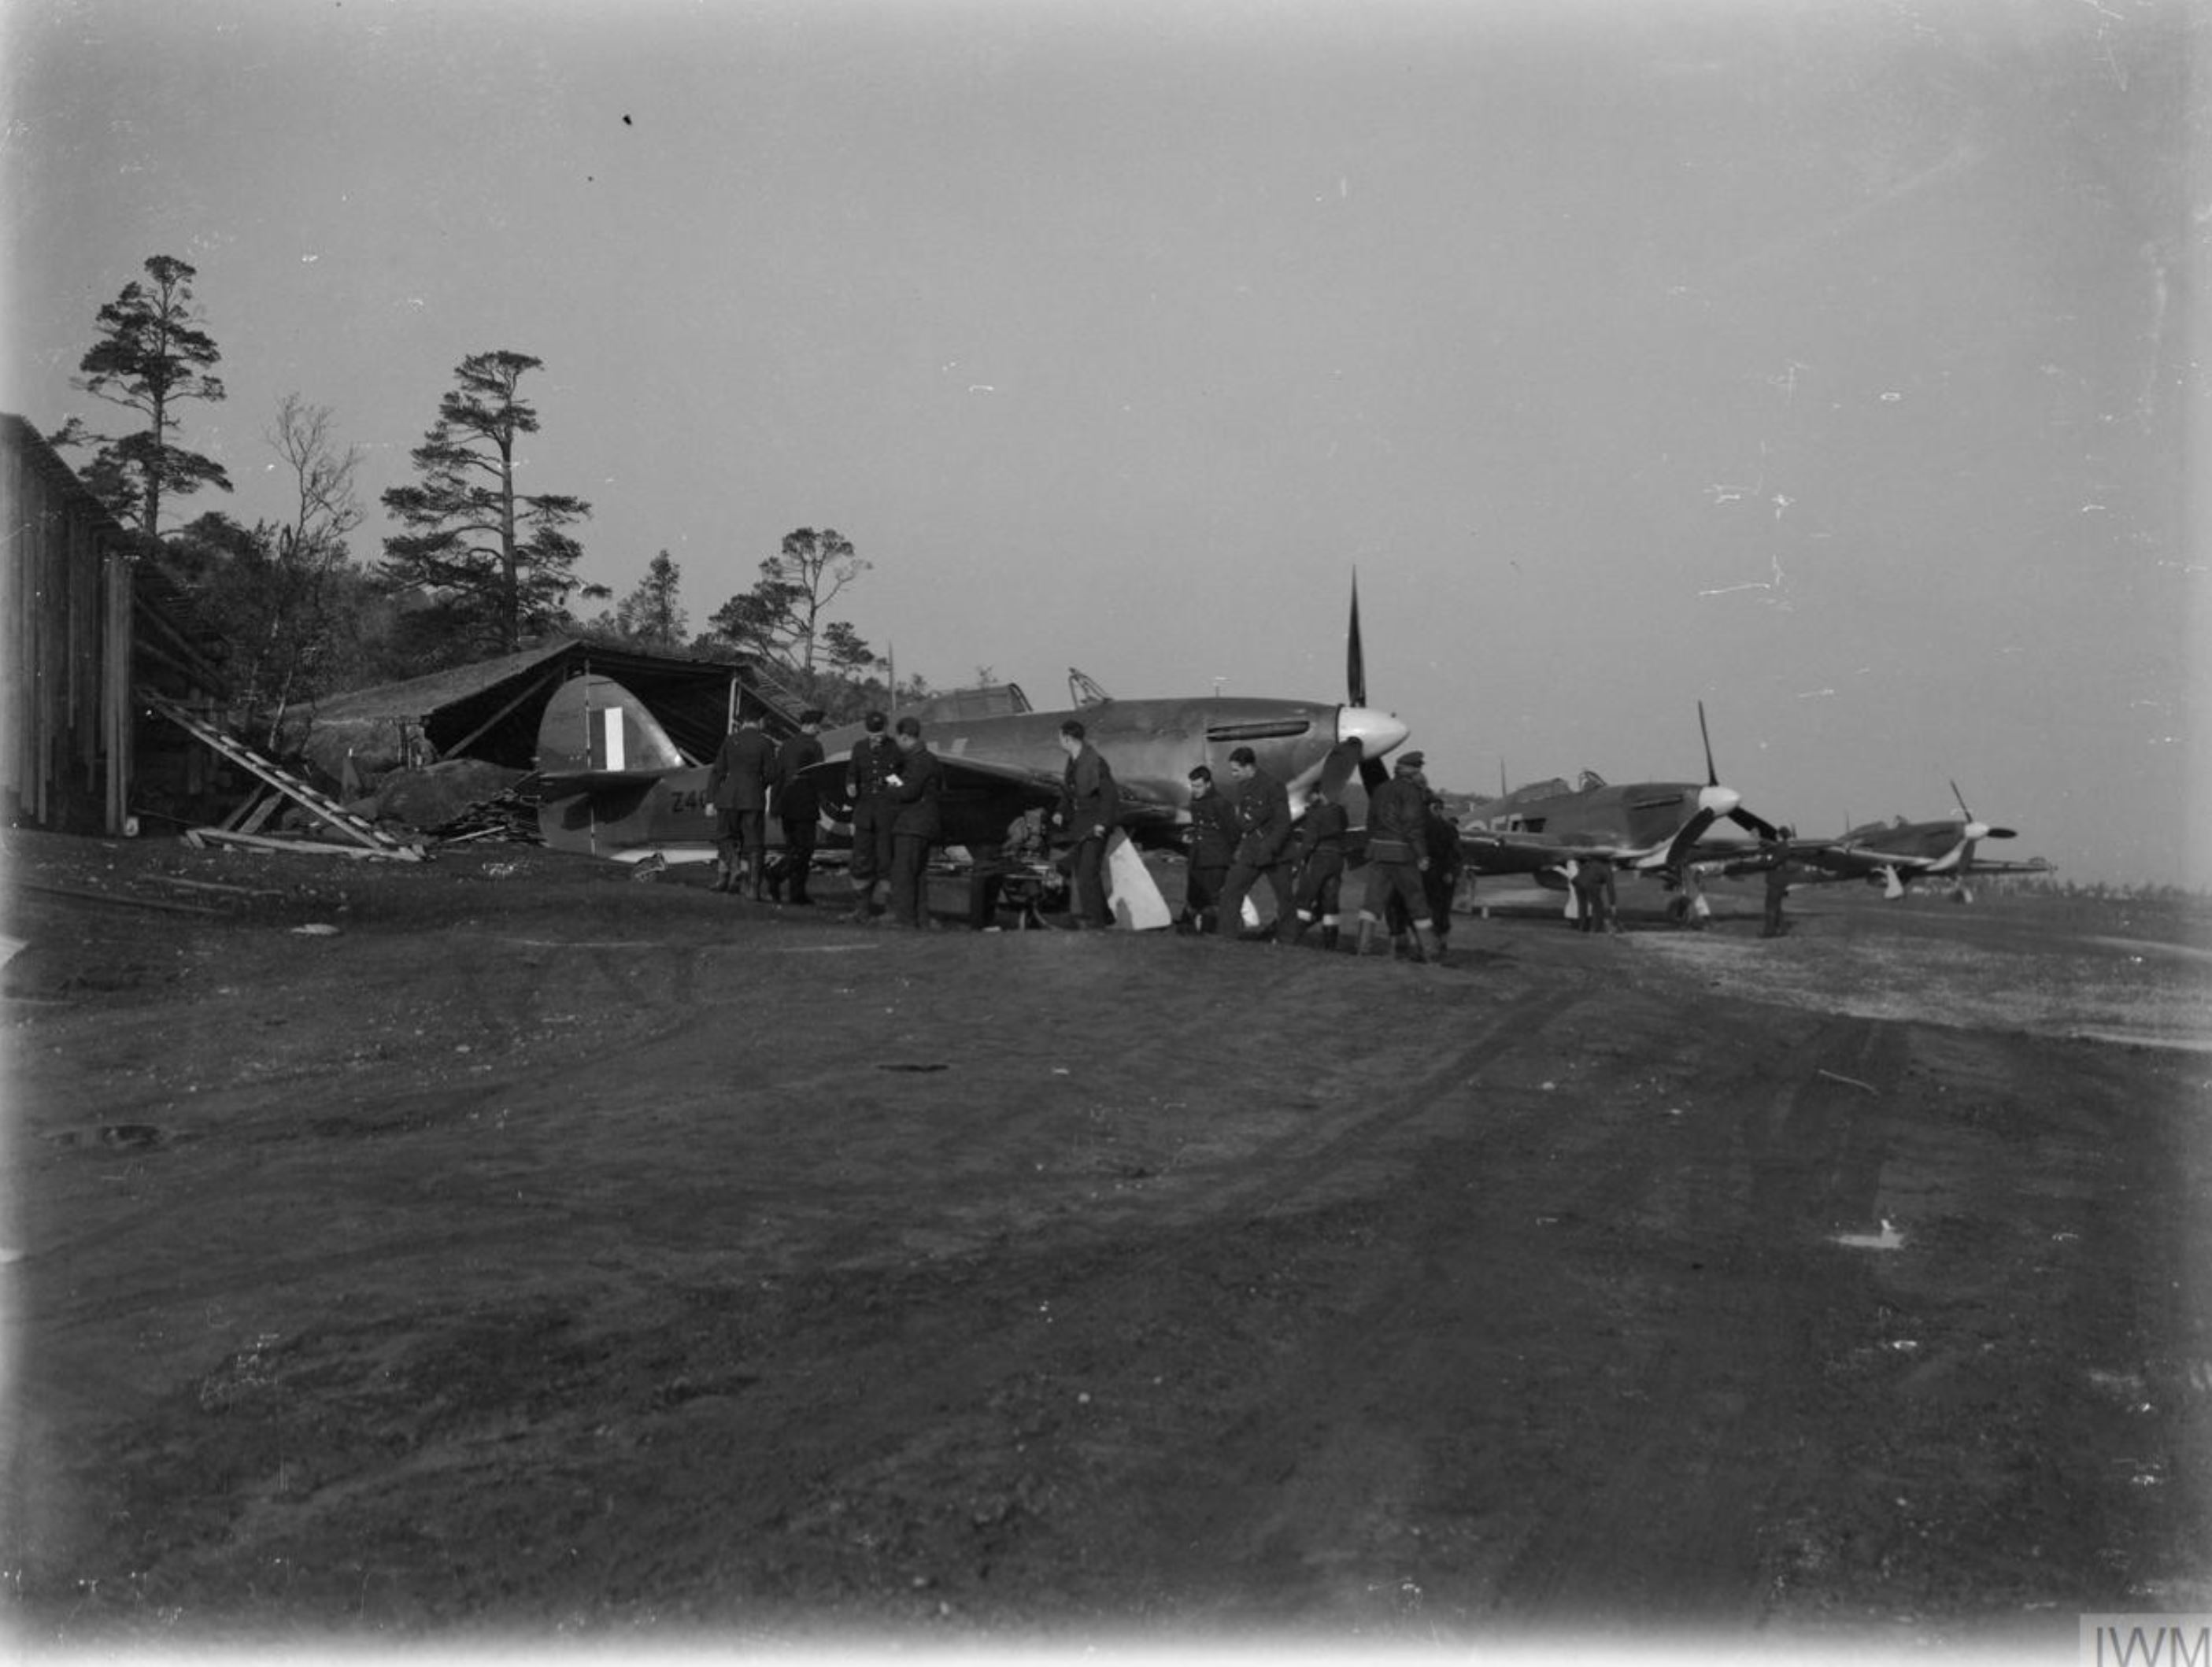 Hurricane IIb Trop RAF 151 Wing 81Sqn Fxxx Z41xx or Vaenga Oct 1941 IWM CR32